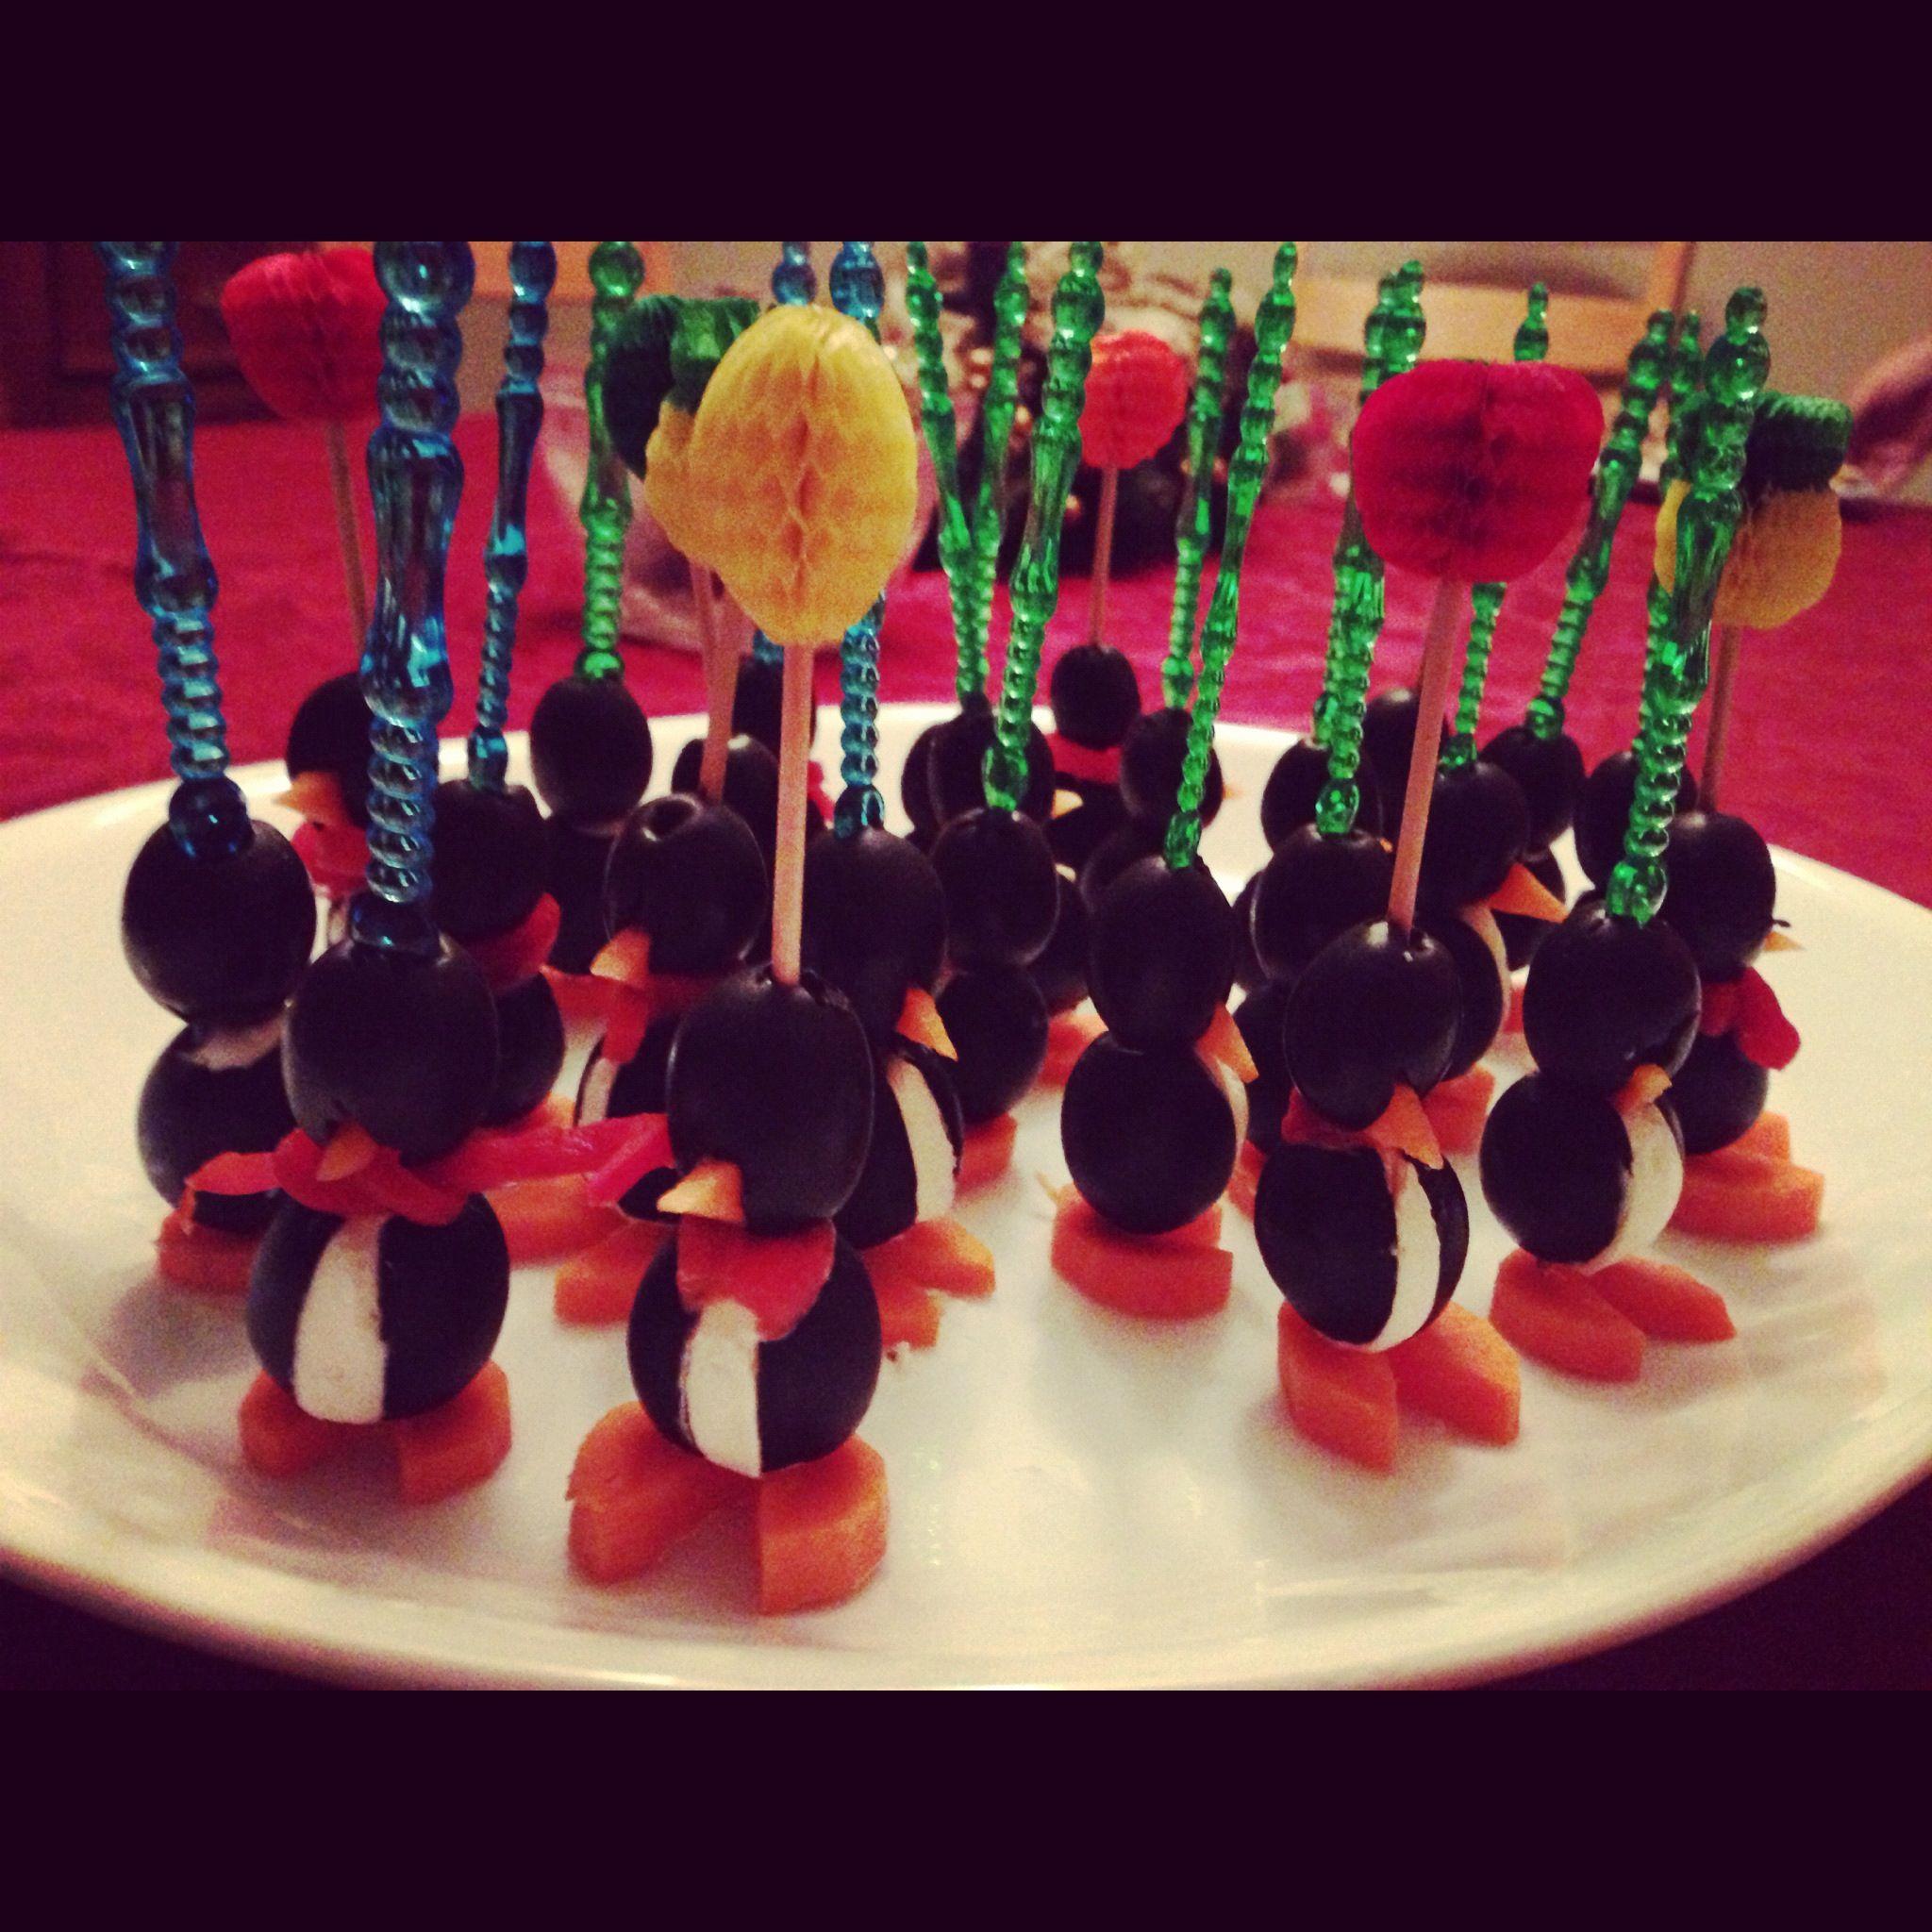 Little Olive Penguin Appetizers. Cute Christmas Party Idea